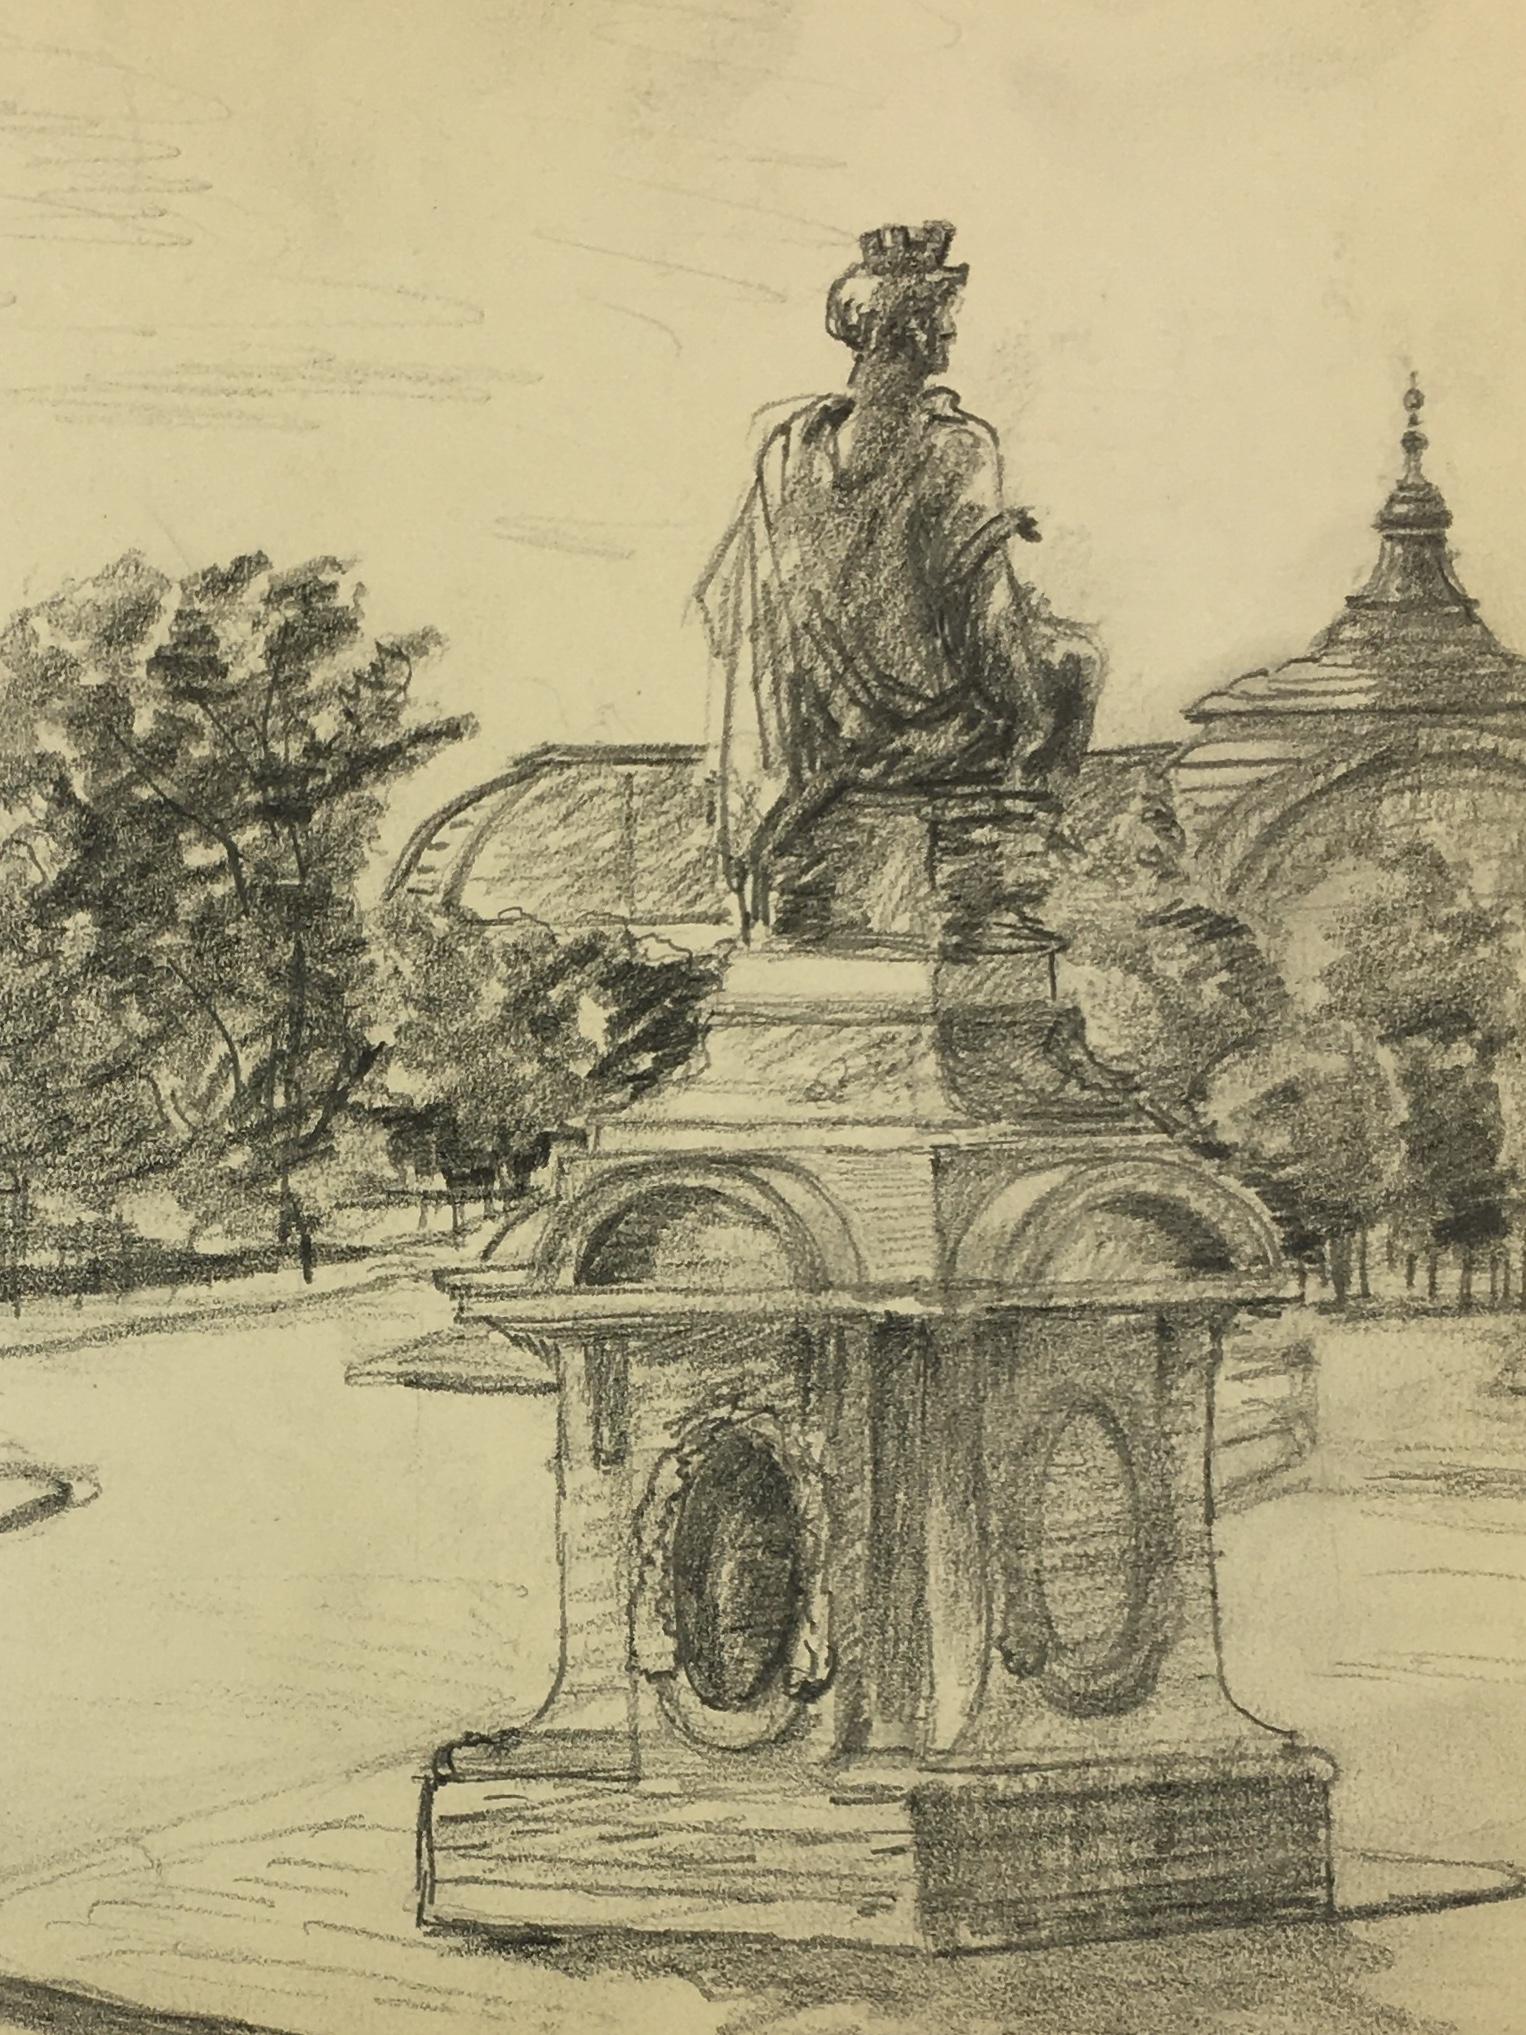 Paris, France Original Art - Paris, VB, 1935